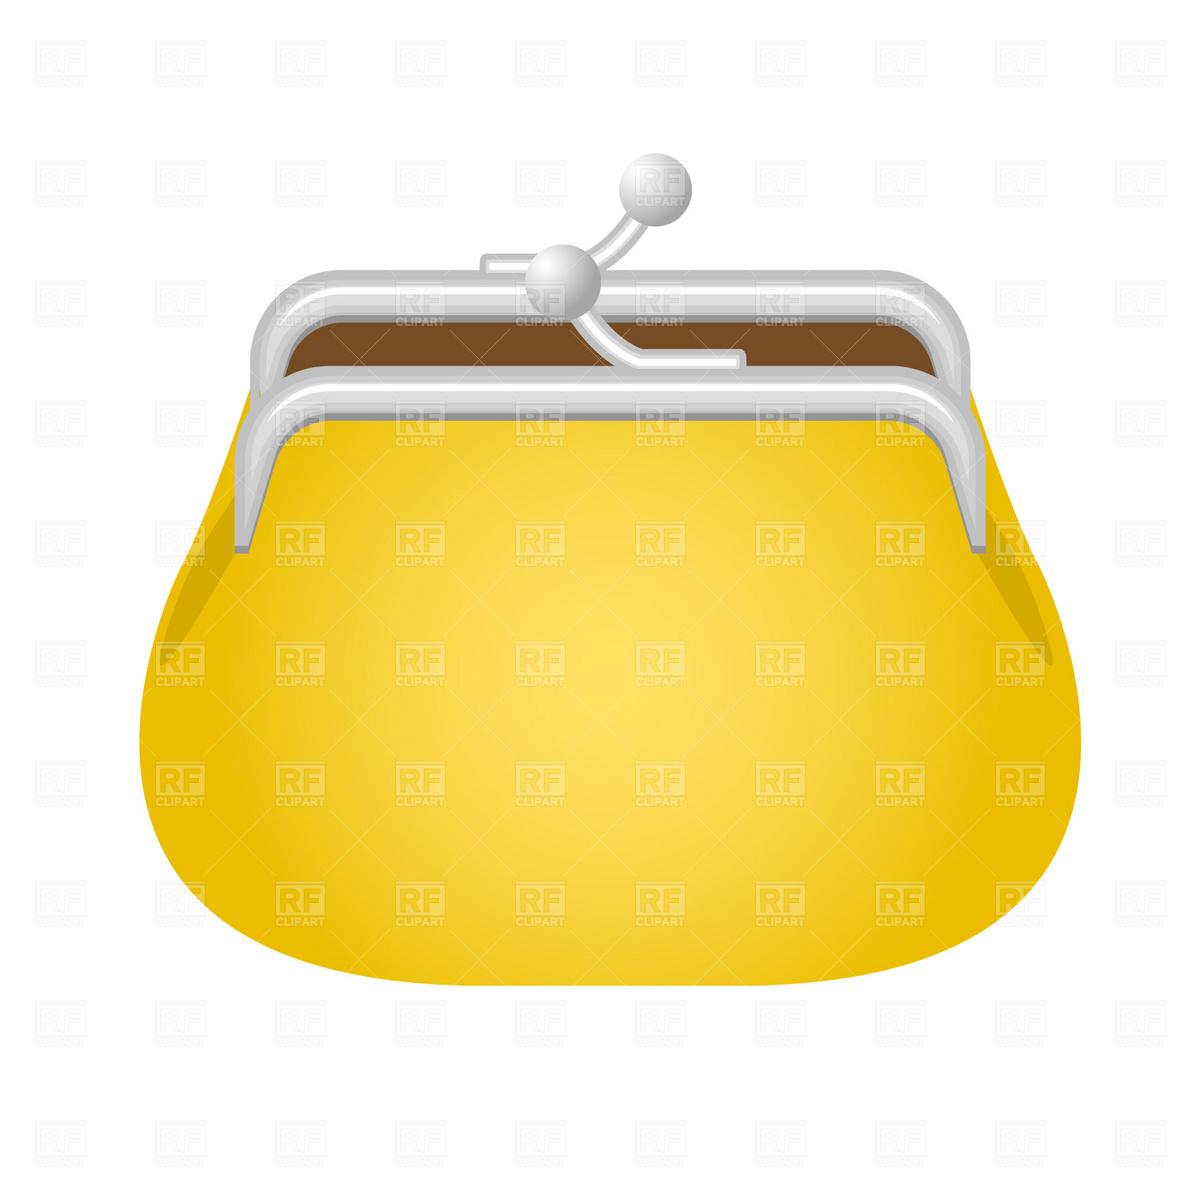 Handbag Purse Clipart - Clipart Suggest